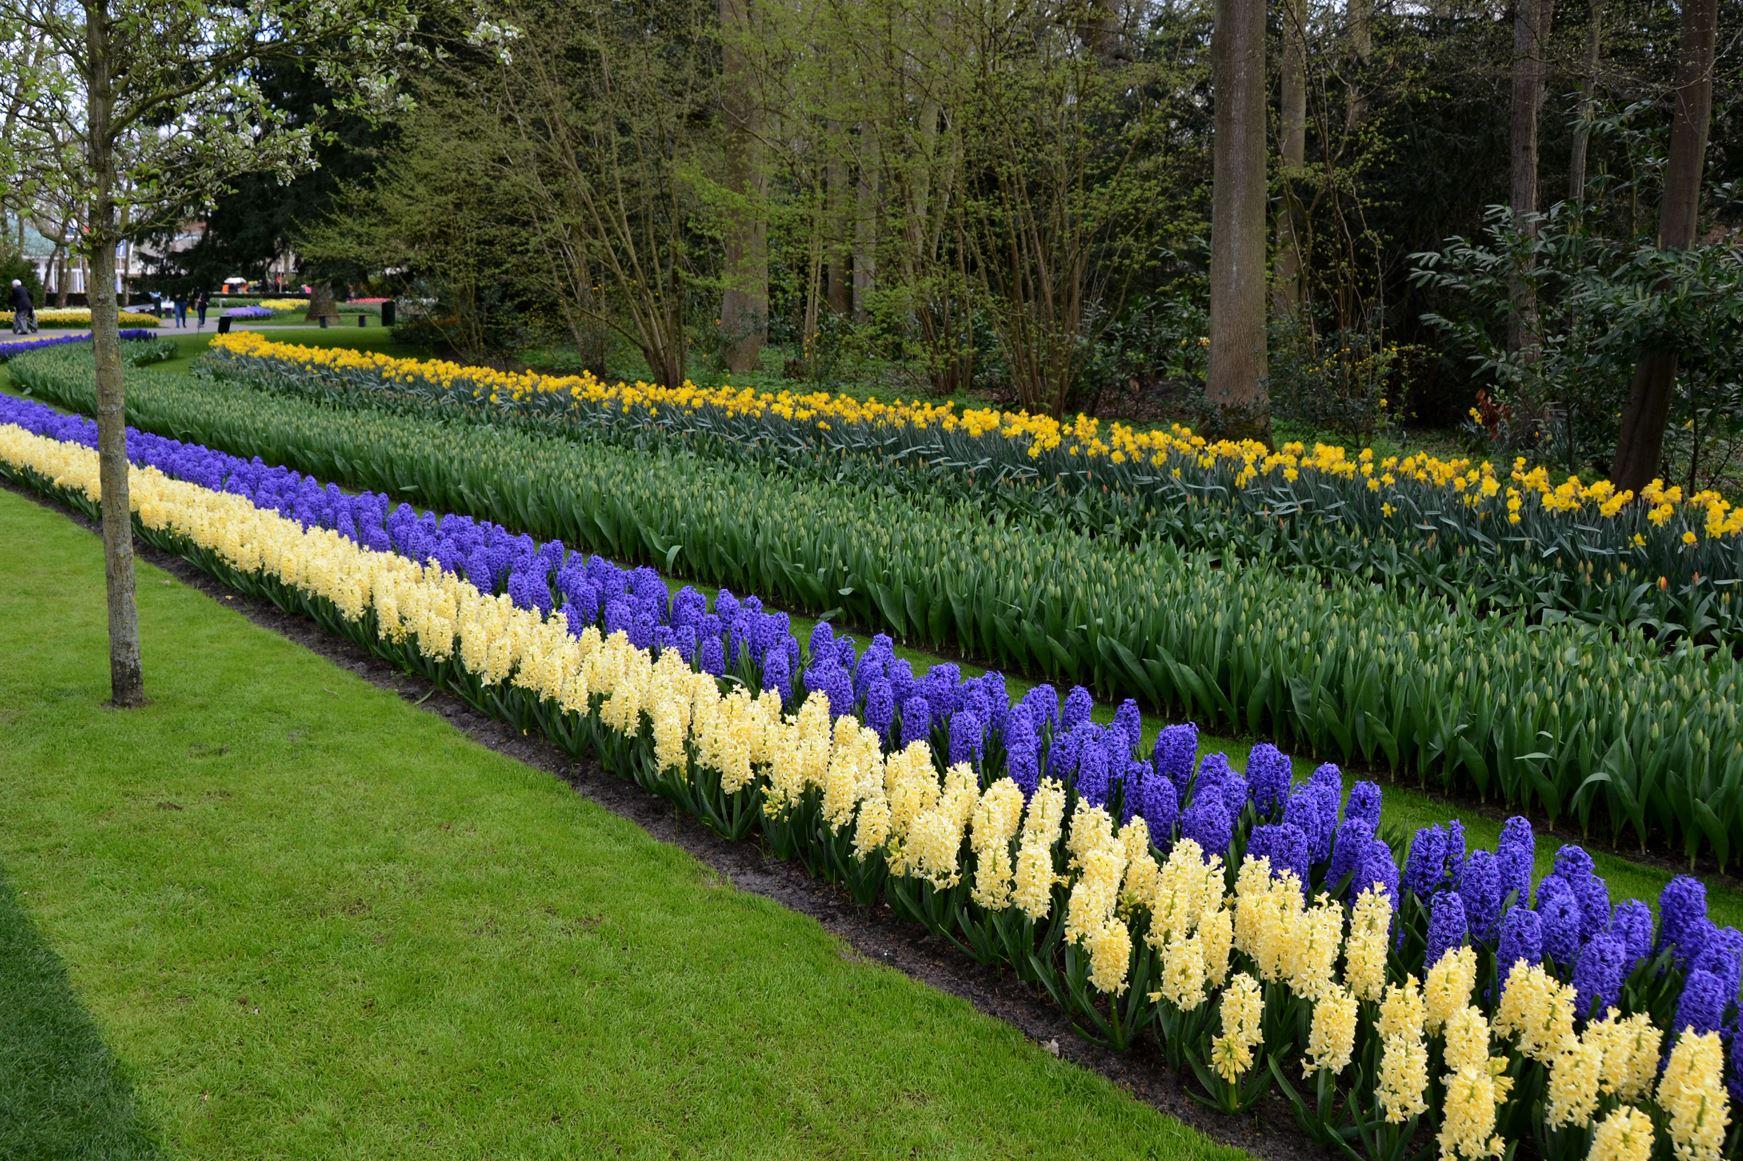 Row Flower Garden : Spring visit to keukenhof s gardens exceeds all